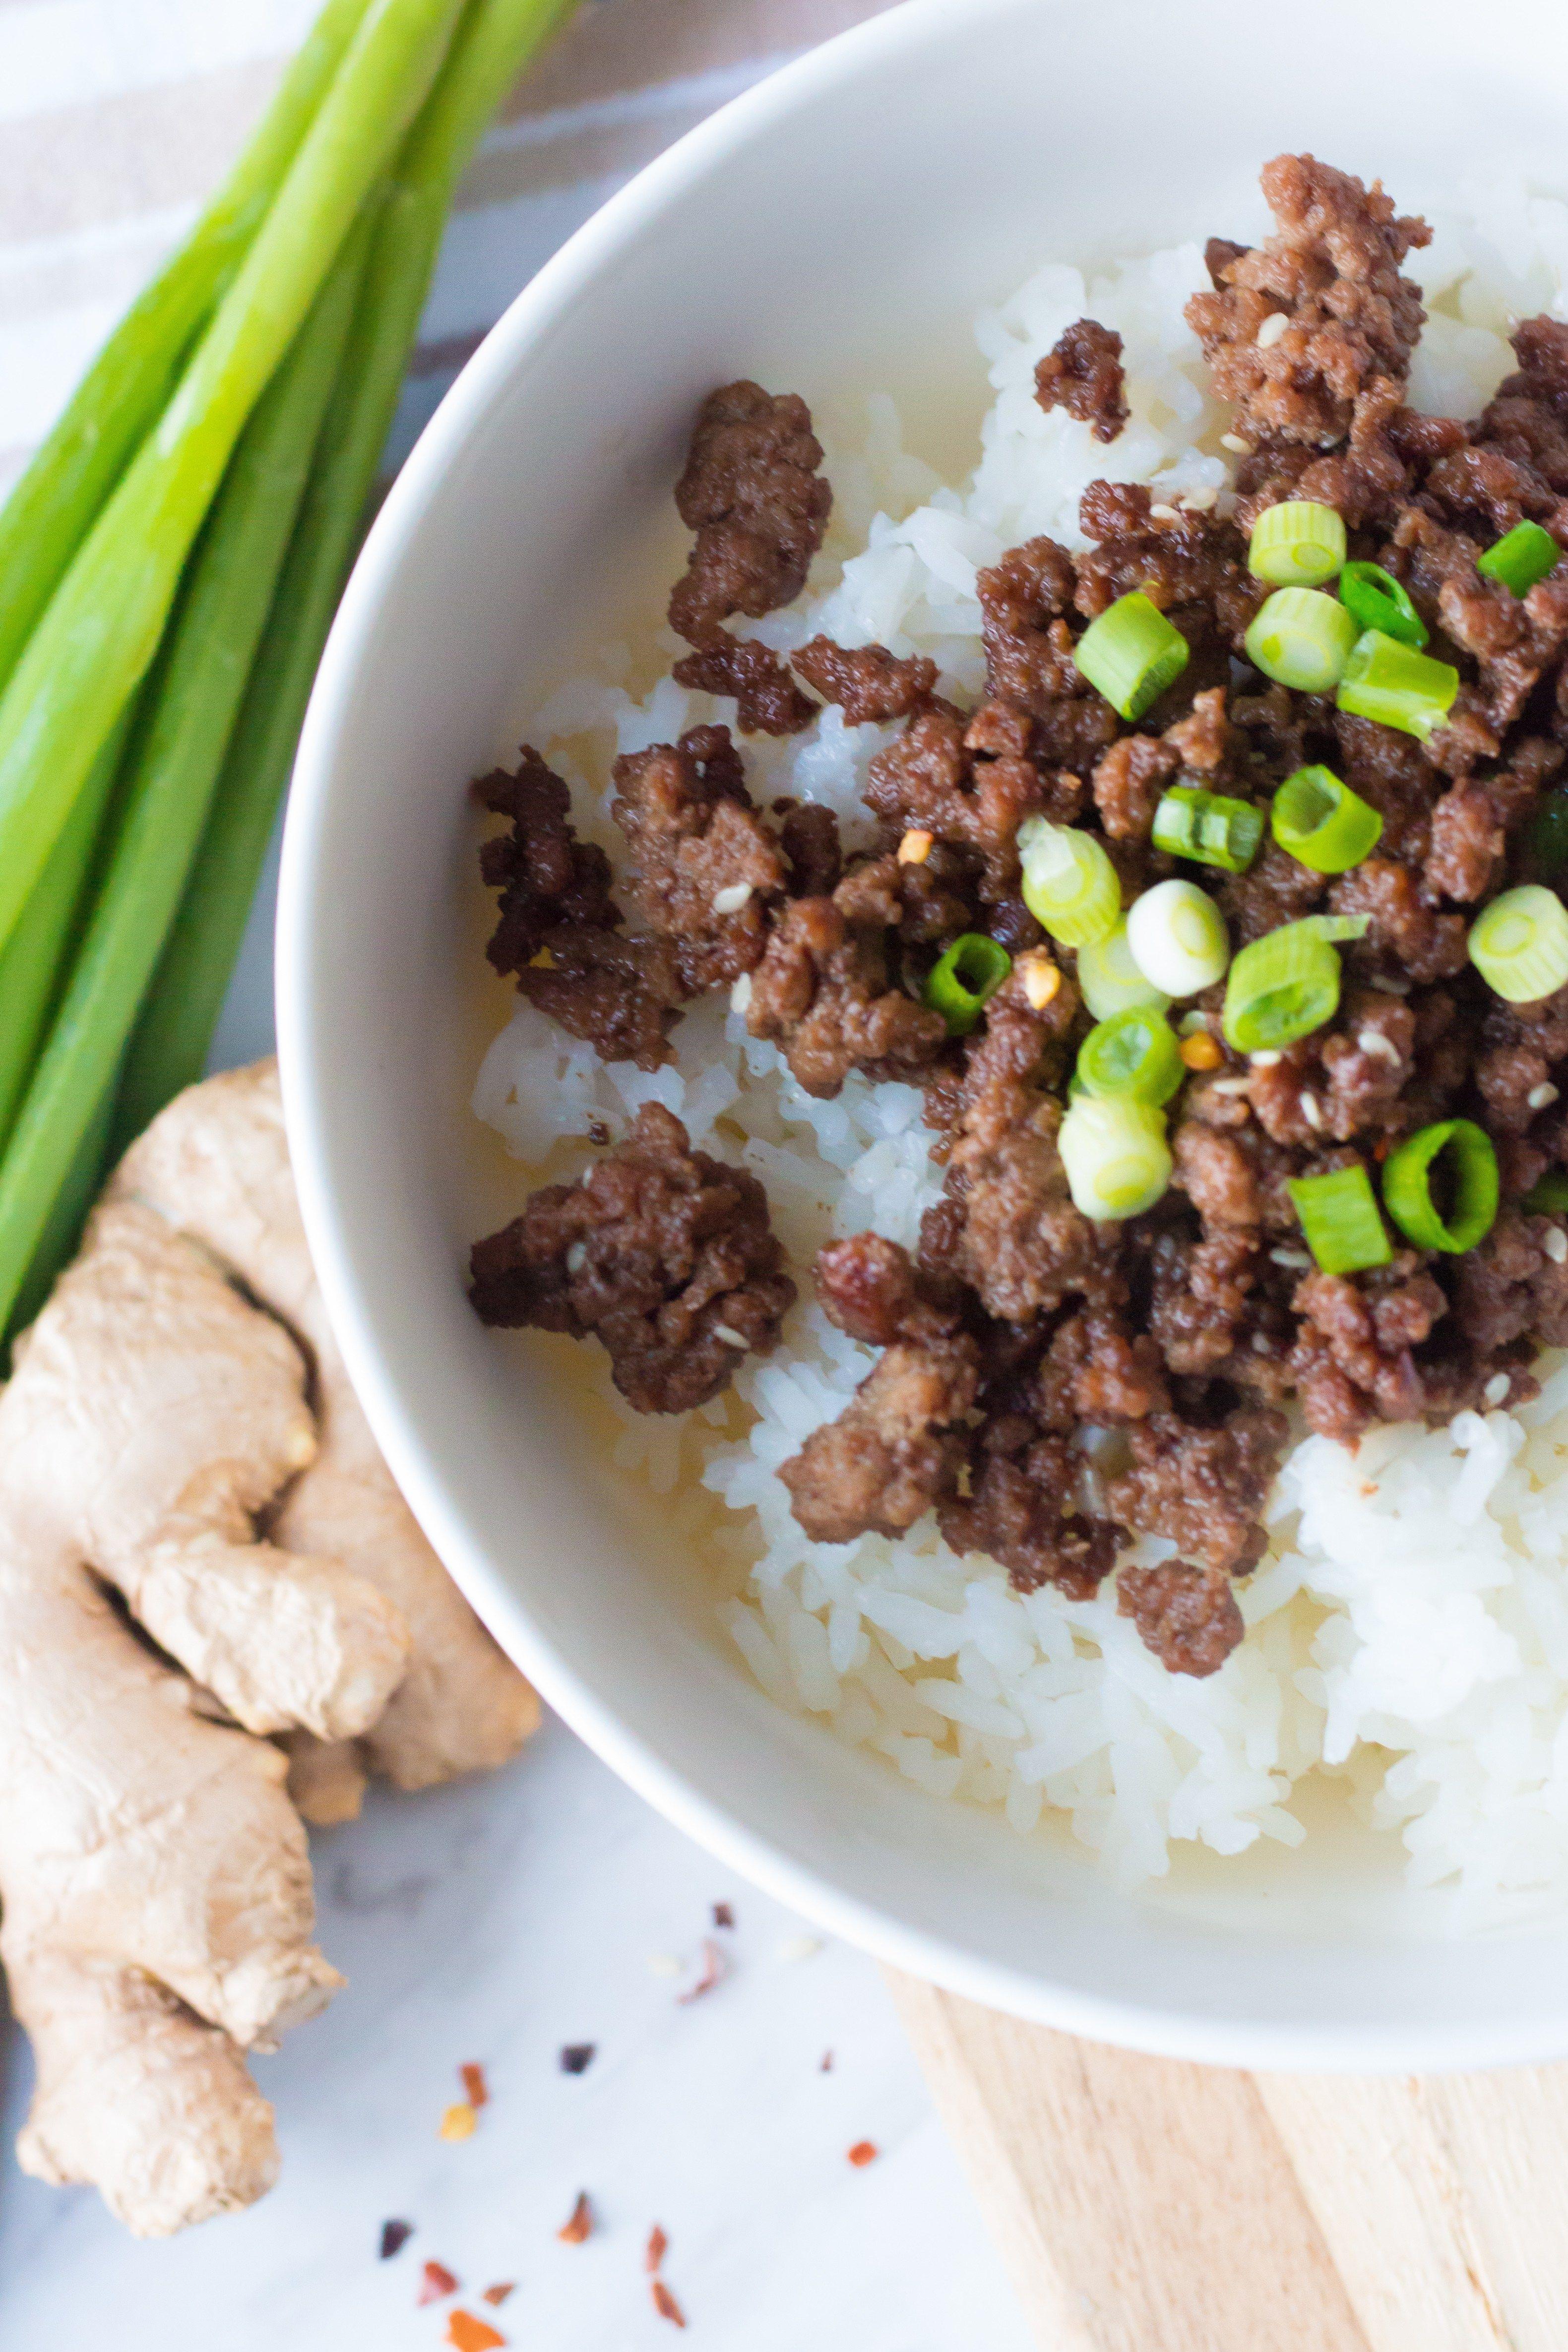 Tasty Korean Ground Beef And Rice Bowl Recipe Korean Ground Beef Ground Pork Recipes Easy Rice Bowls Recipes